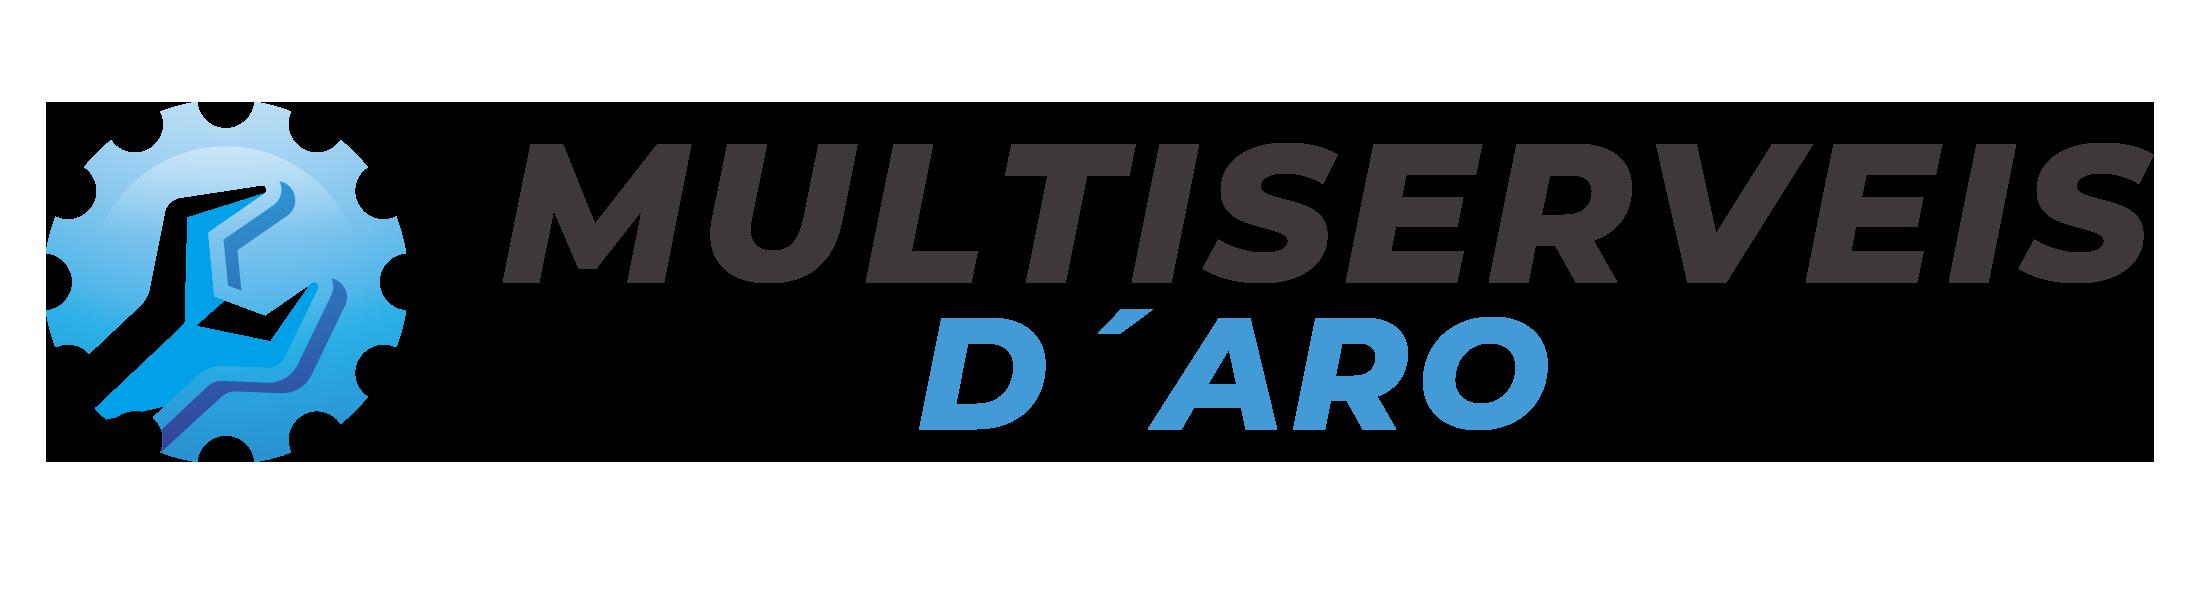 Multiserveis D´aro, tu empresa de servicios